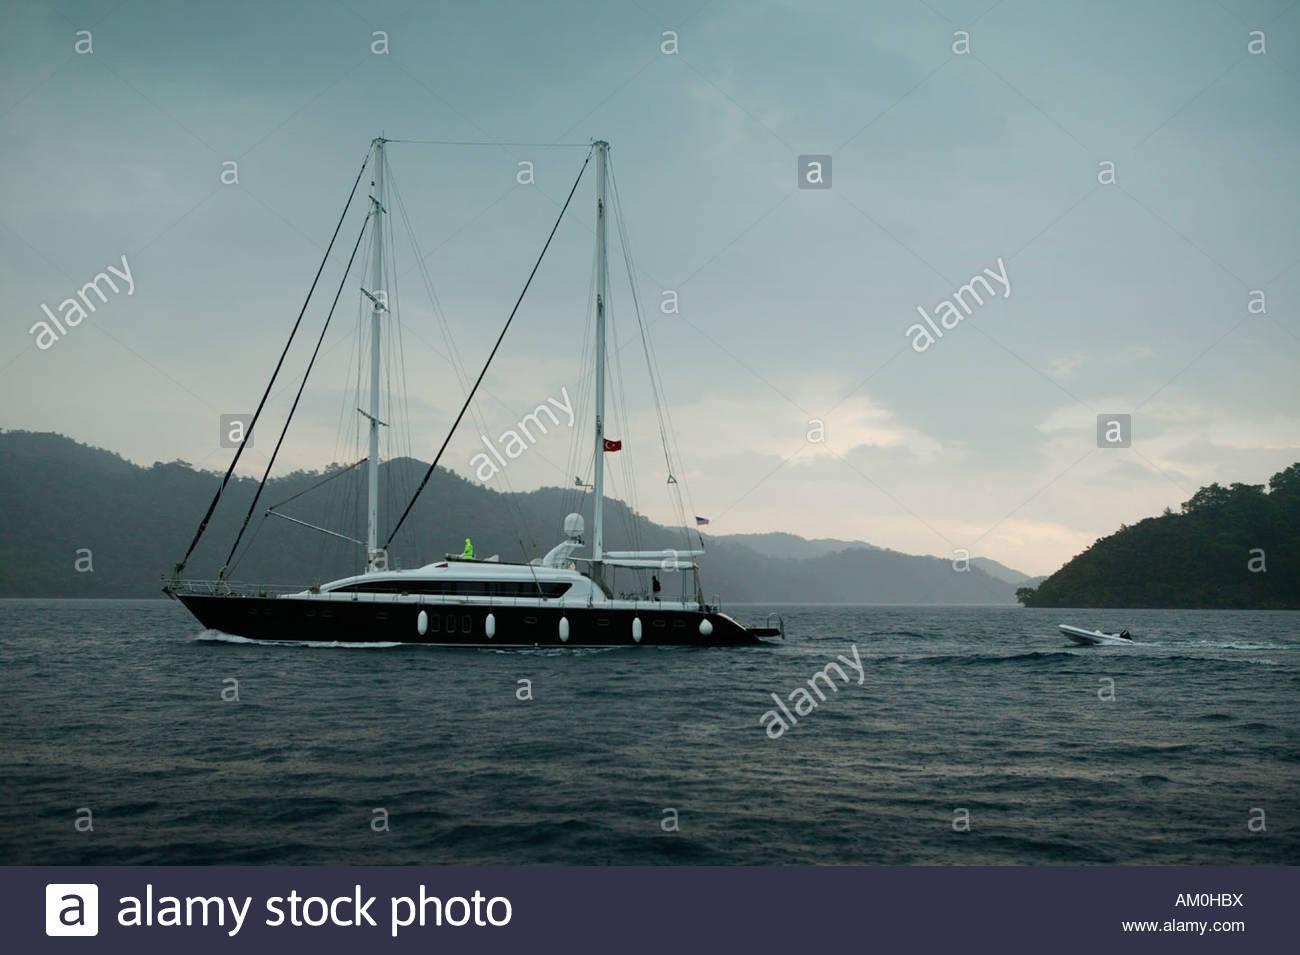 Modern Schooner Type Sailing Yacht Motoring In Bad Weather Göcek